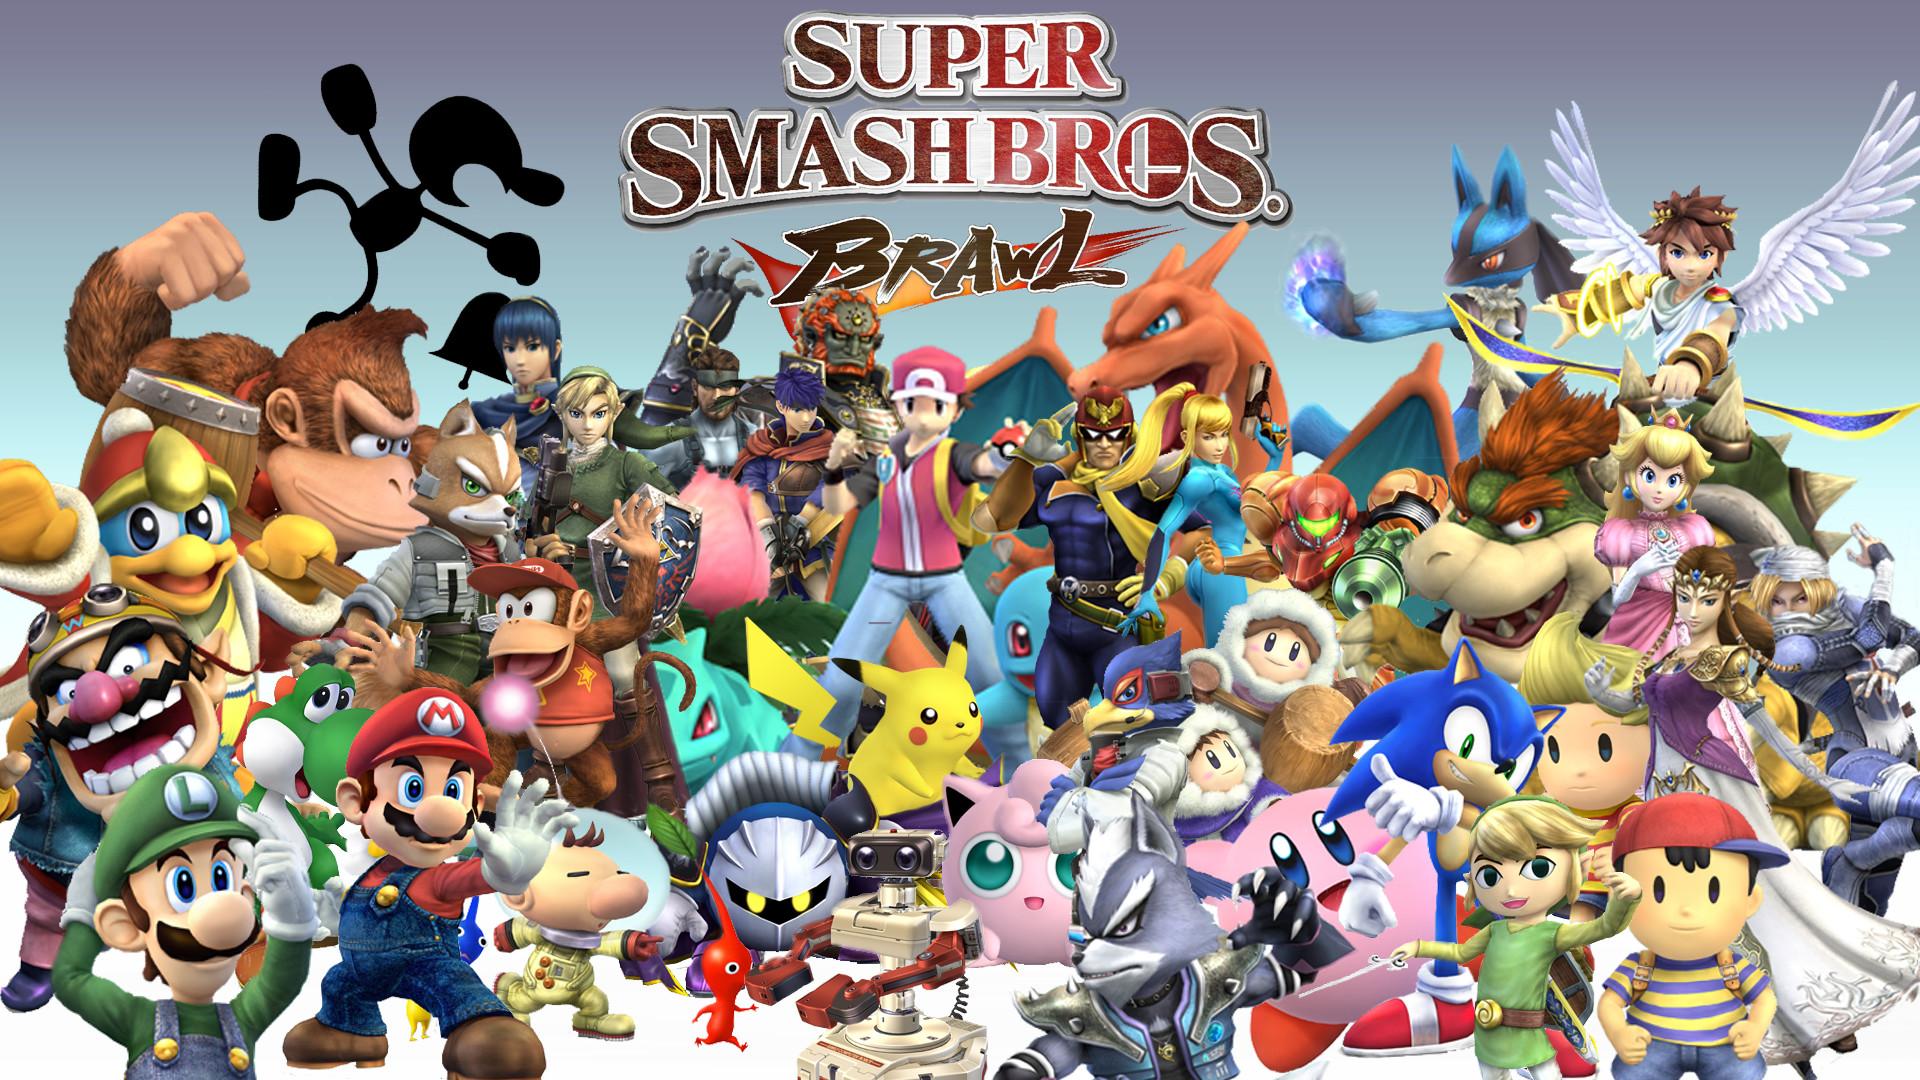 Super Smash Bros Wallpaper 74 Pictures